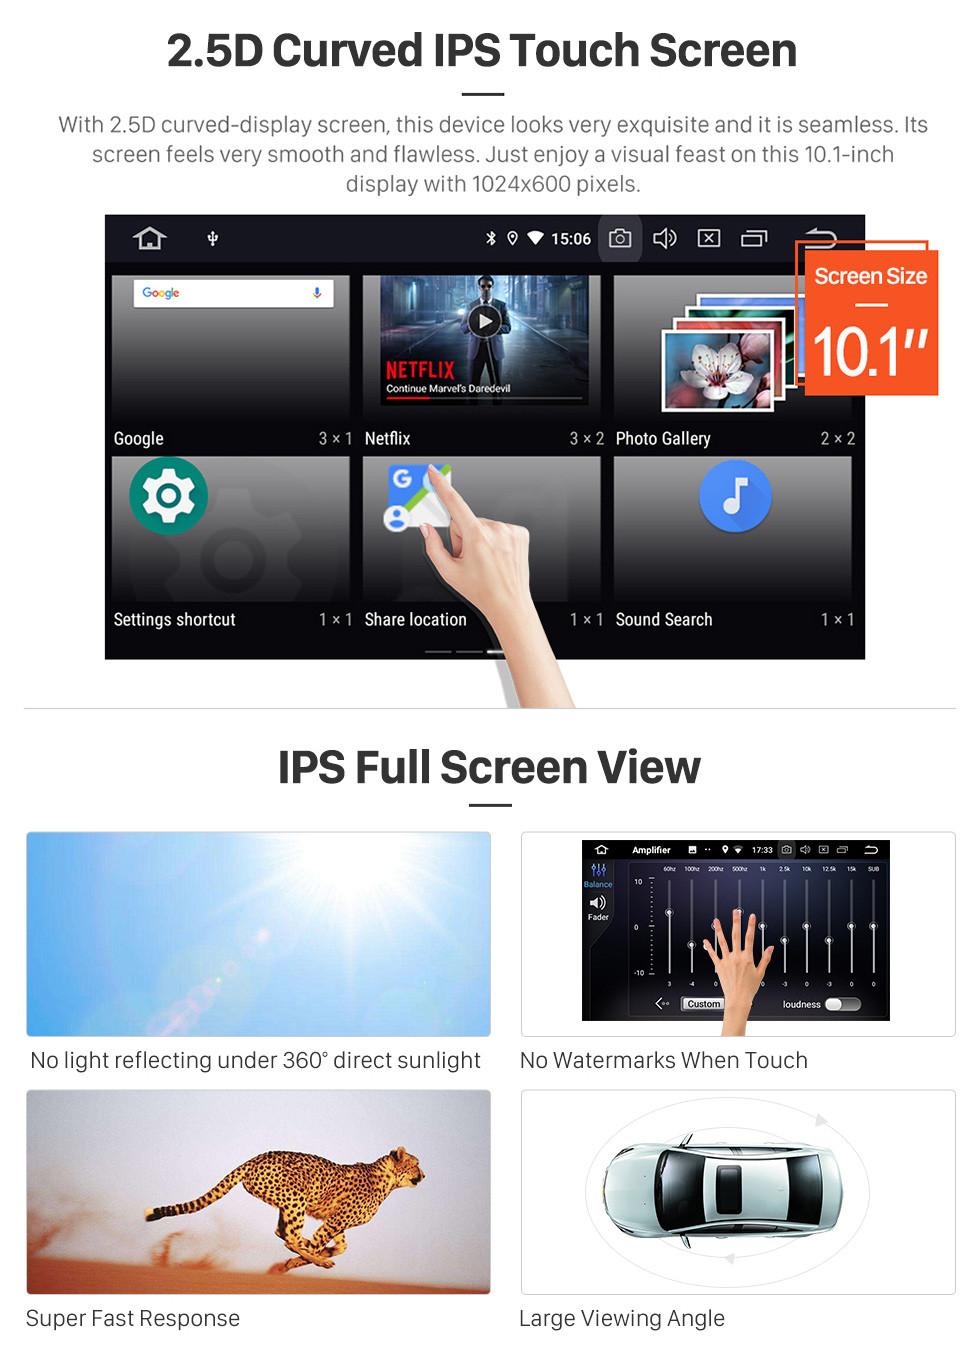 Seicane 2016 KIA K5 OPTIMA Radio Ersatz mit Android 9.0 DVD-Player GPS-Navigationssystem Touchscreen 3G WiFi Link Spiegel OBD2 Video Control Lenkrad USB SD Rückfahrkamera